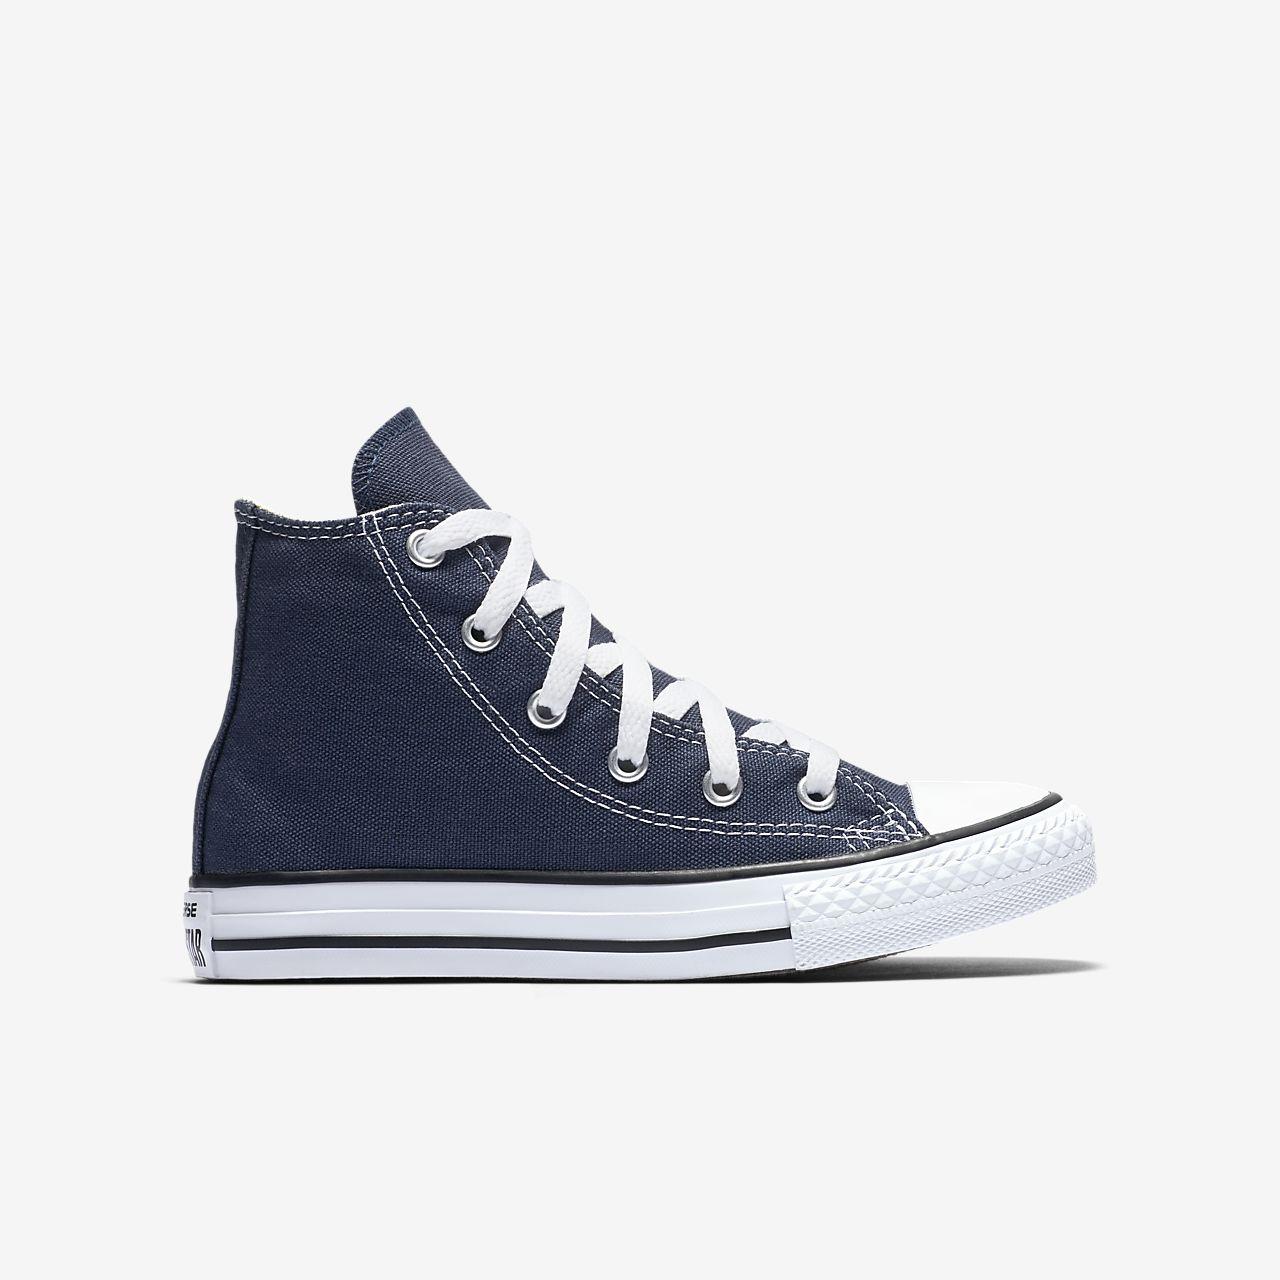 f6c7845cc2a4 Converse Chuck Taylor All Star High Top (10.5c-3y) Little Kids  Shoe ...